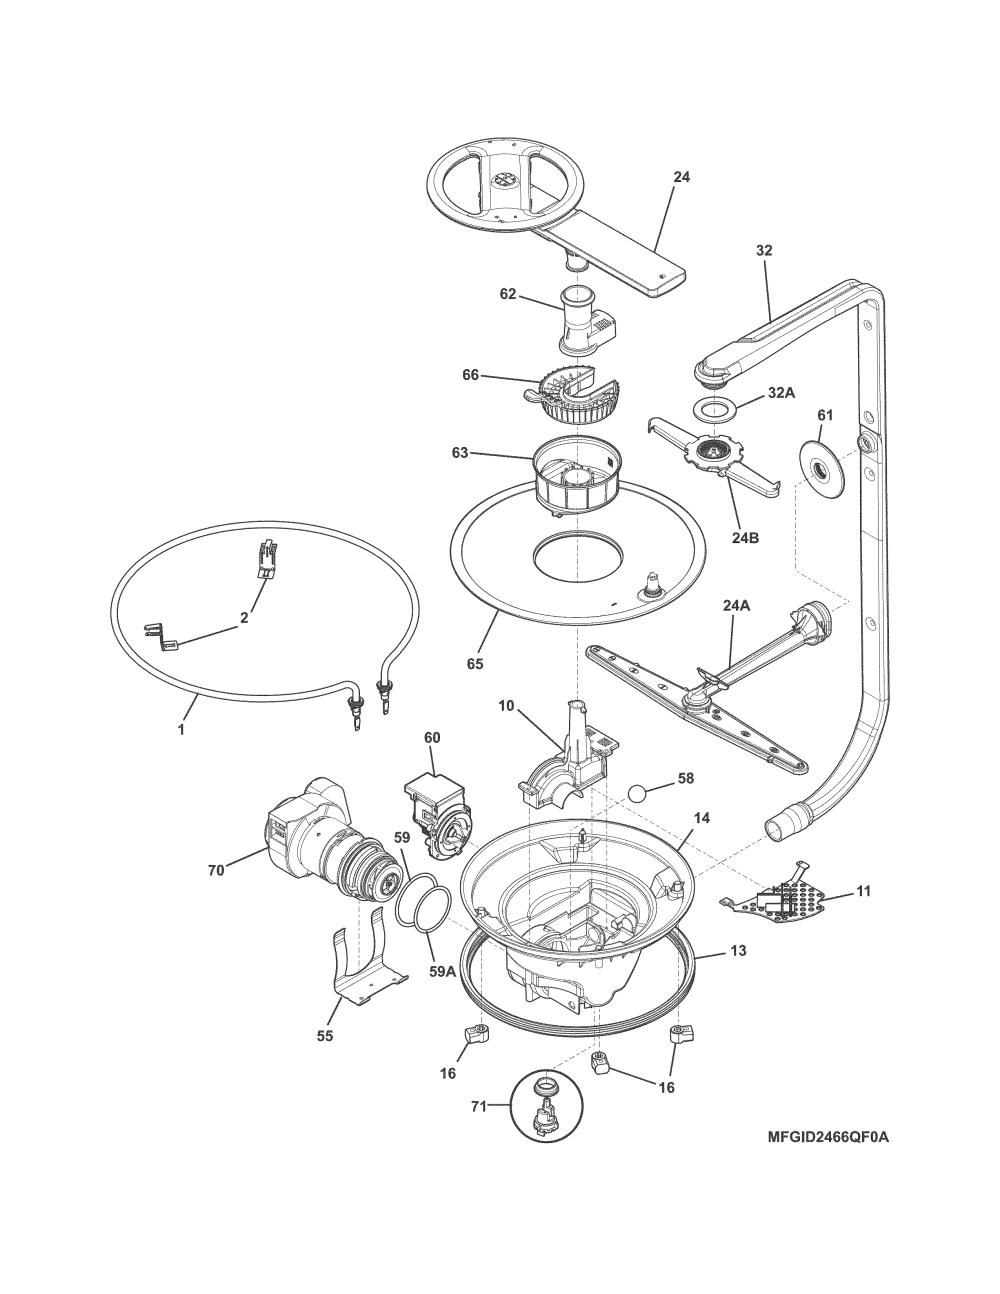 medium resolution of frigidaire fgid2466qf4a motor pump diagram